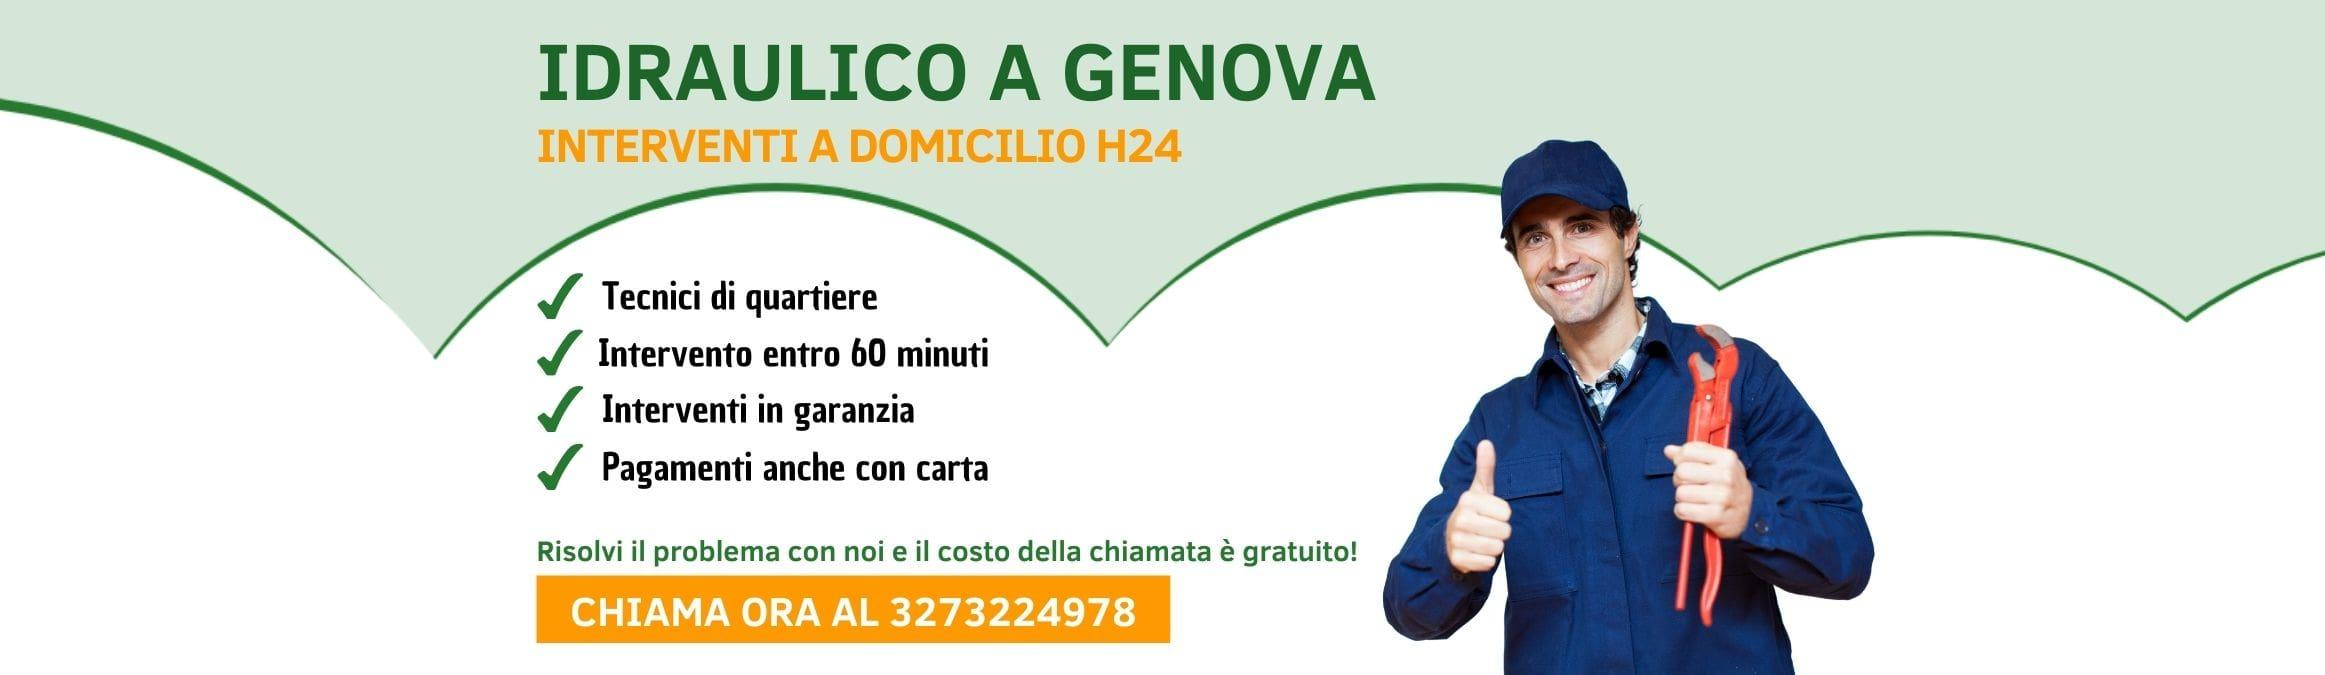 Idraulico a Genova h24